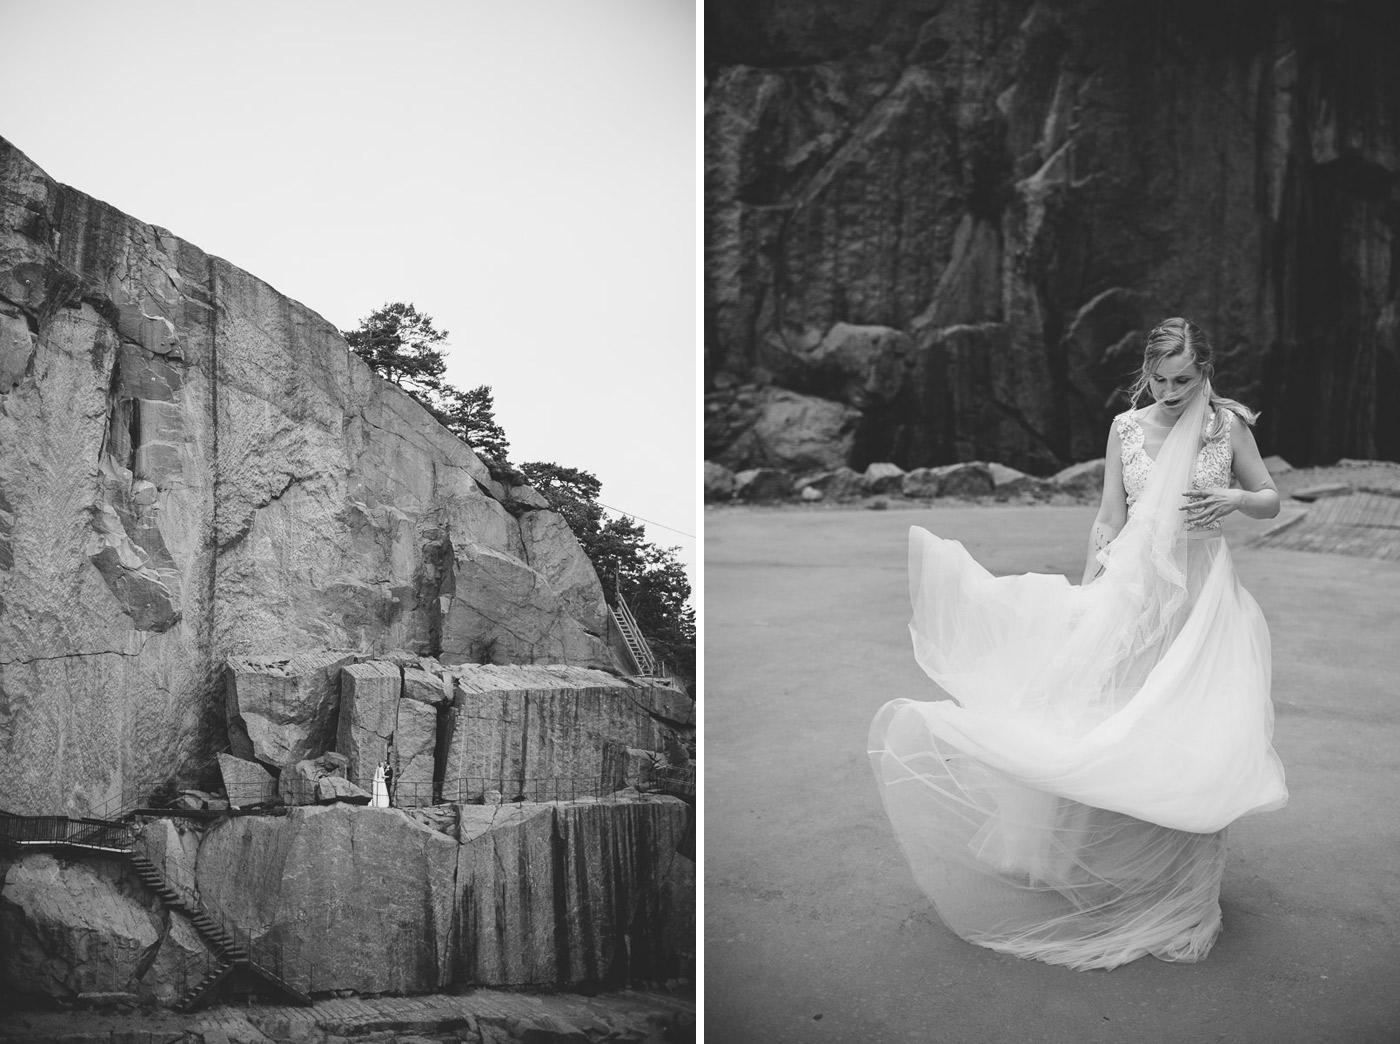 unique wedding ceremony places in nordica